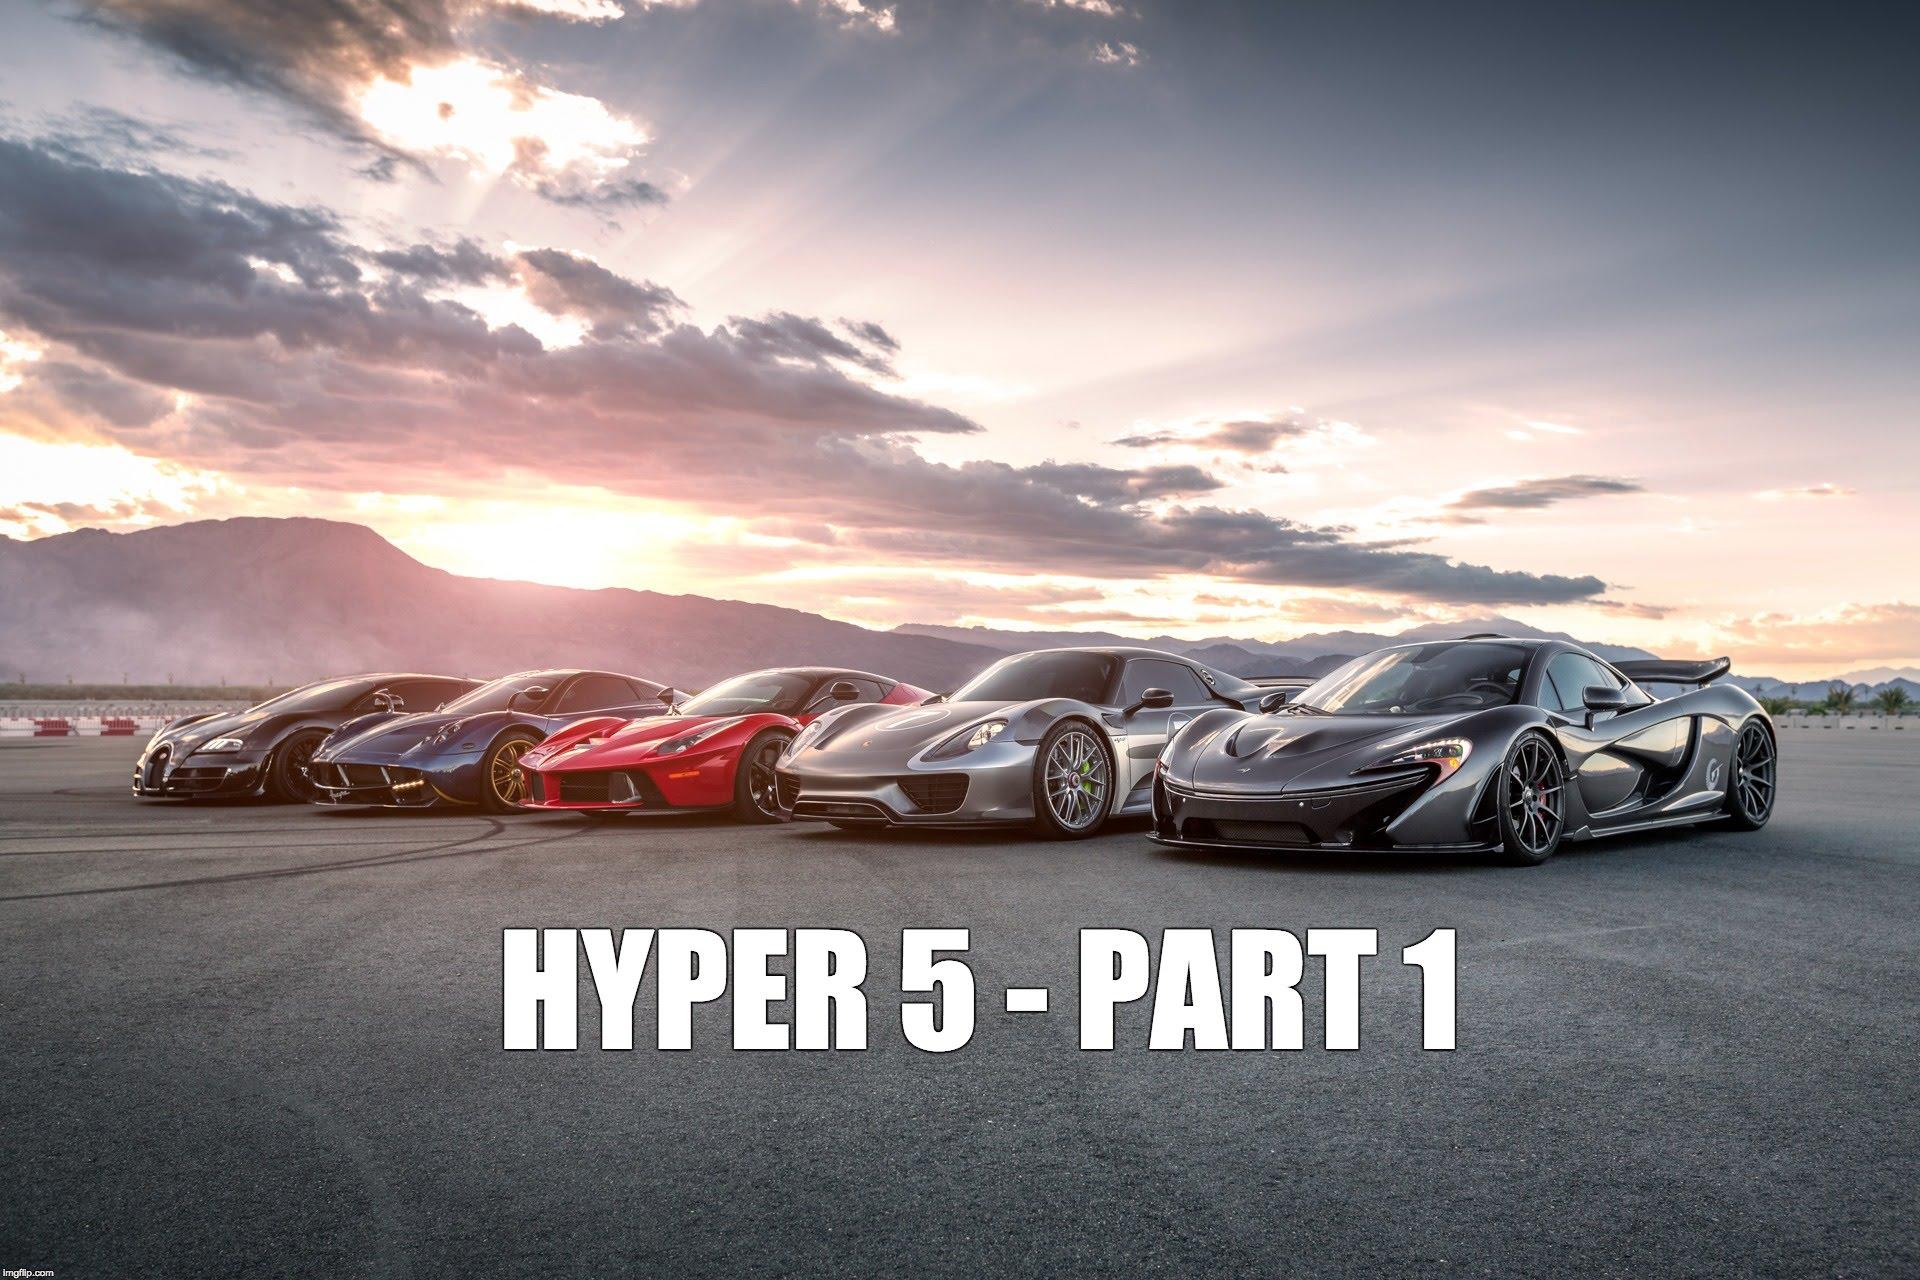 hyper-5-unites-five-amazing-hypercars-for-an-epic-showdown-with-lots-of-horsepower-video-101848_1 Interesting Bugatti Veyron Grand Sport Vitesse Vs Pagani Huayra Cars Trend